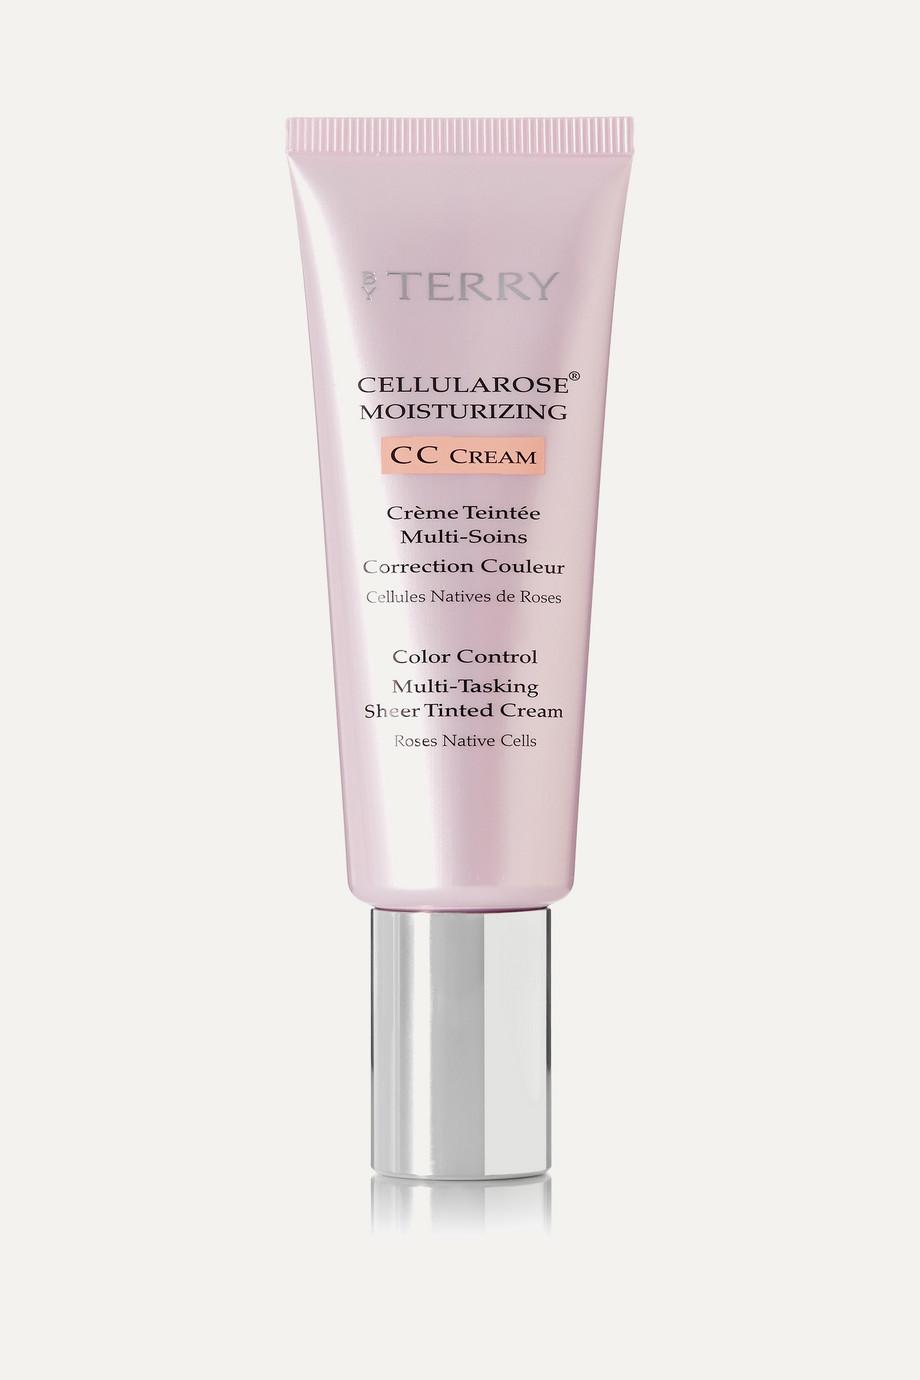 BY TERRY Cellularose® Moisturizing CC Cream - Natural 2, 40g